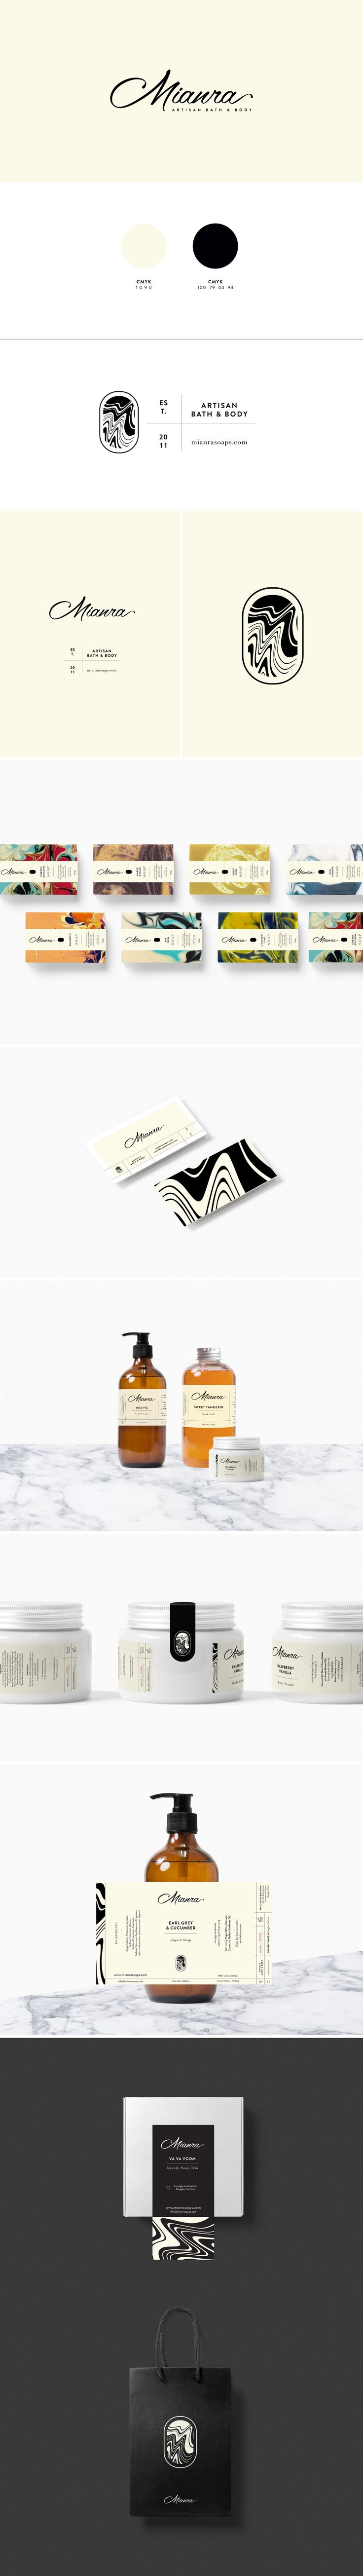 Mianra Brand Identity by Cocorrina